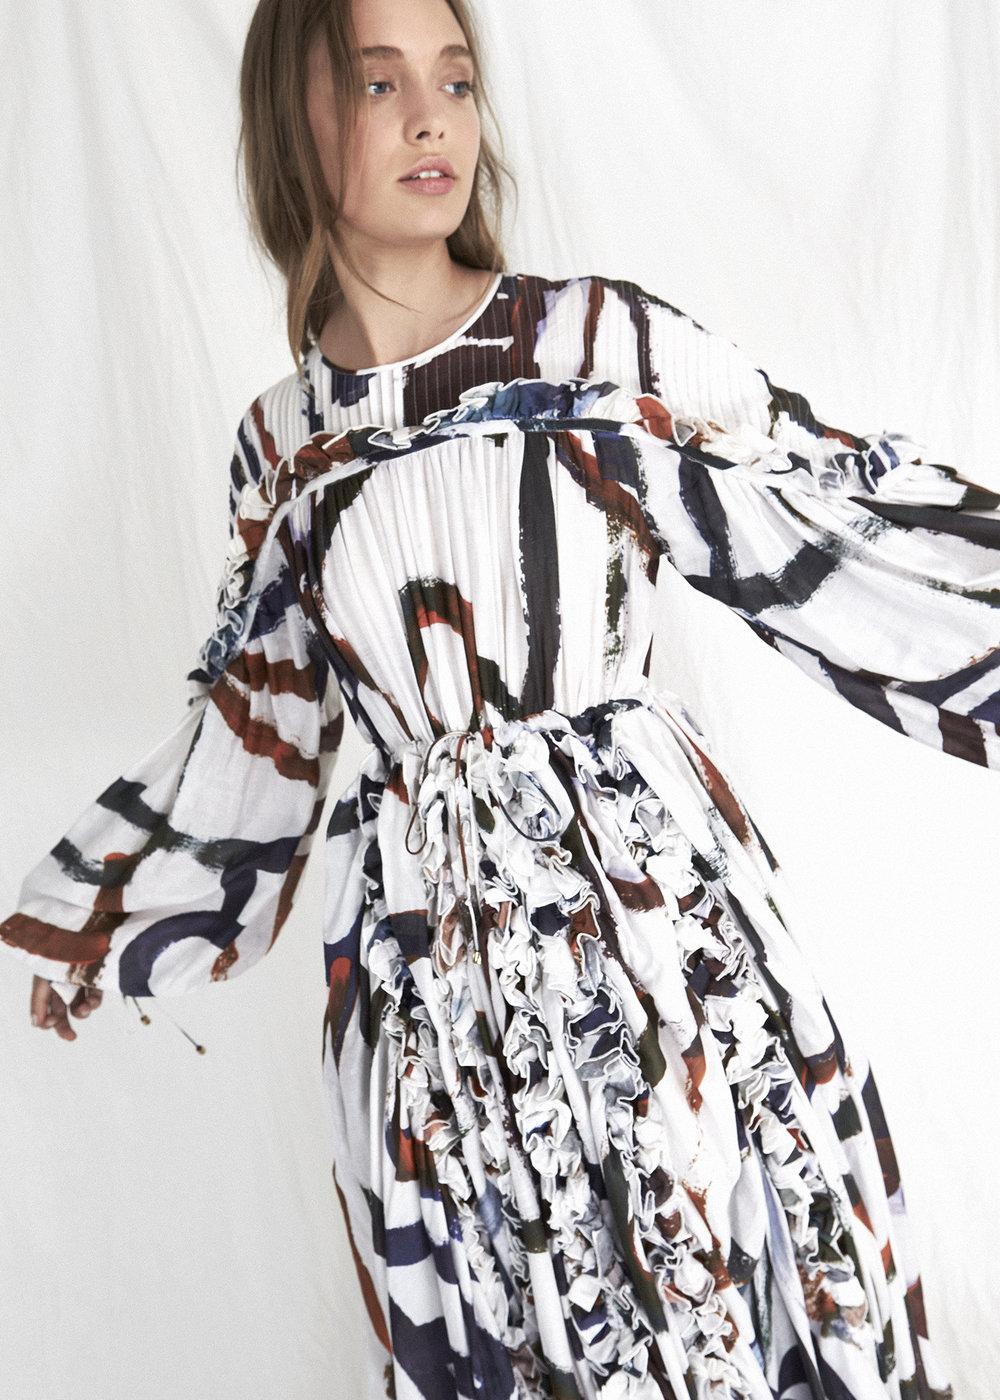 Tindal Gown-AJ18270-Awelye Multi-Crop 2.jpg